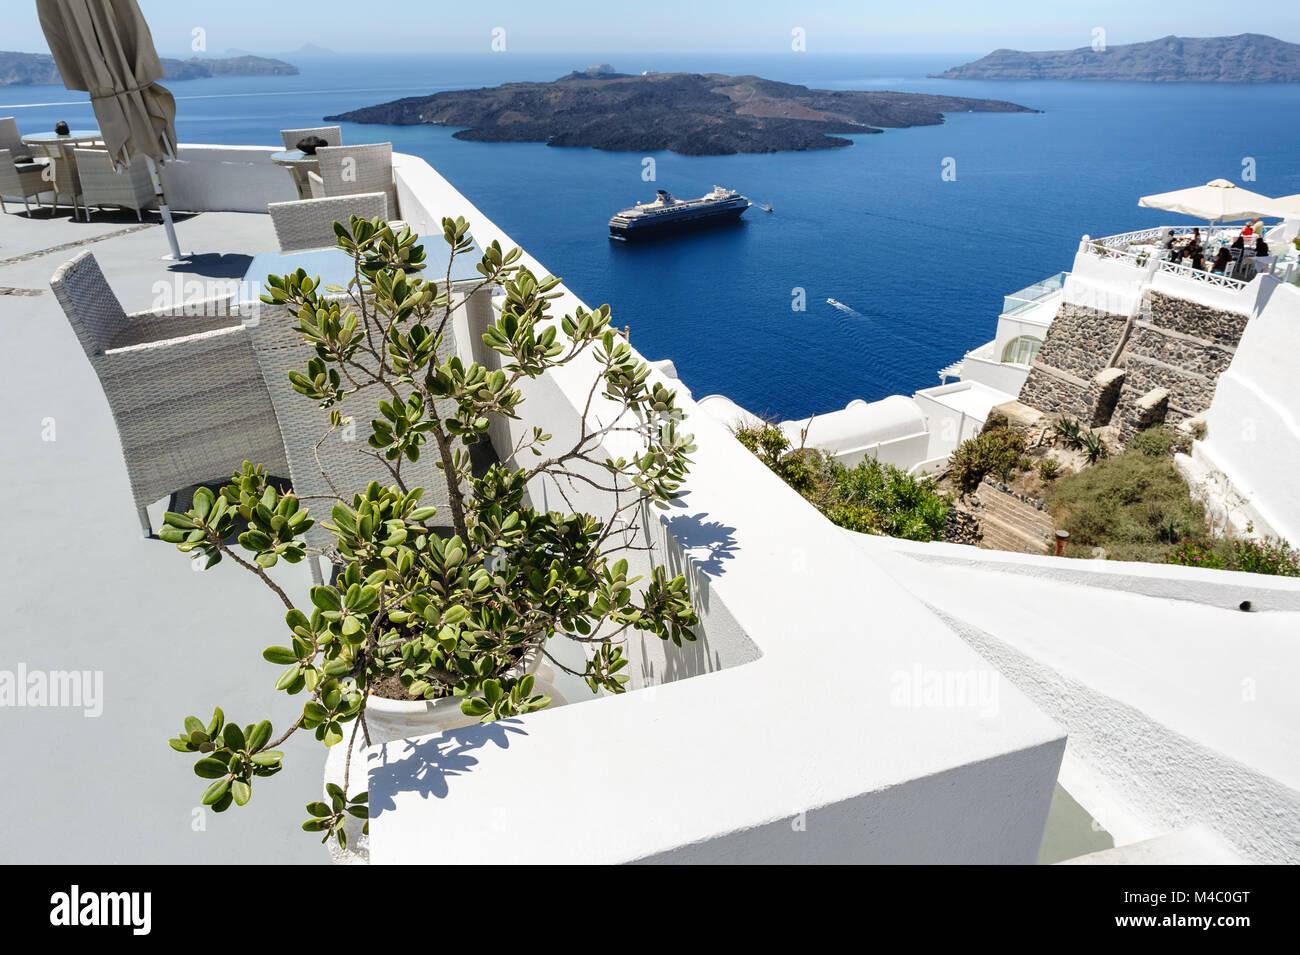 Oia luxury decks and patios - Stock Image